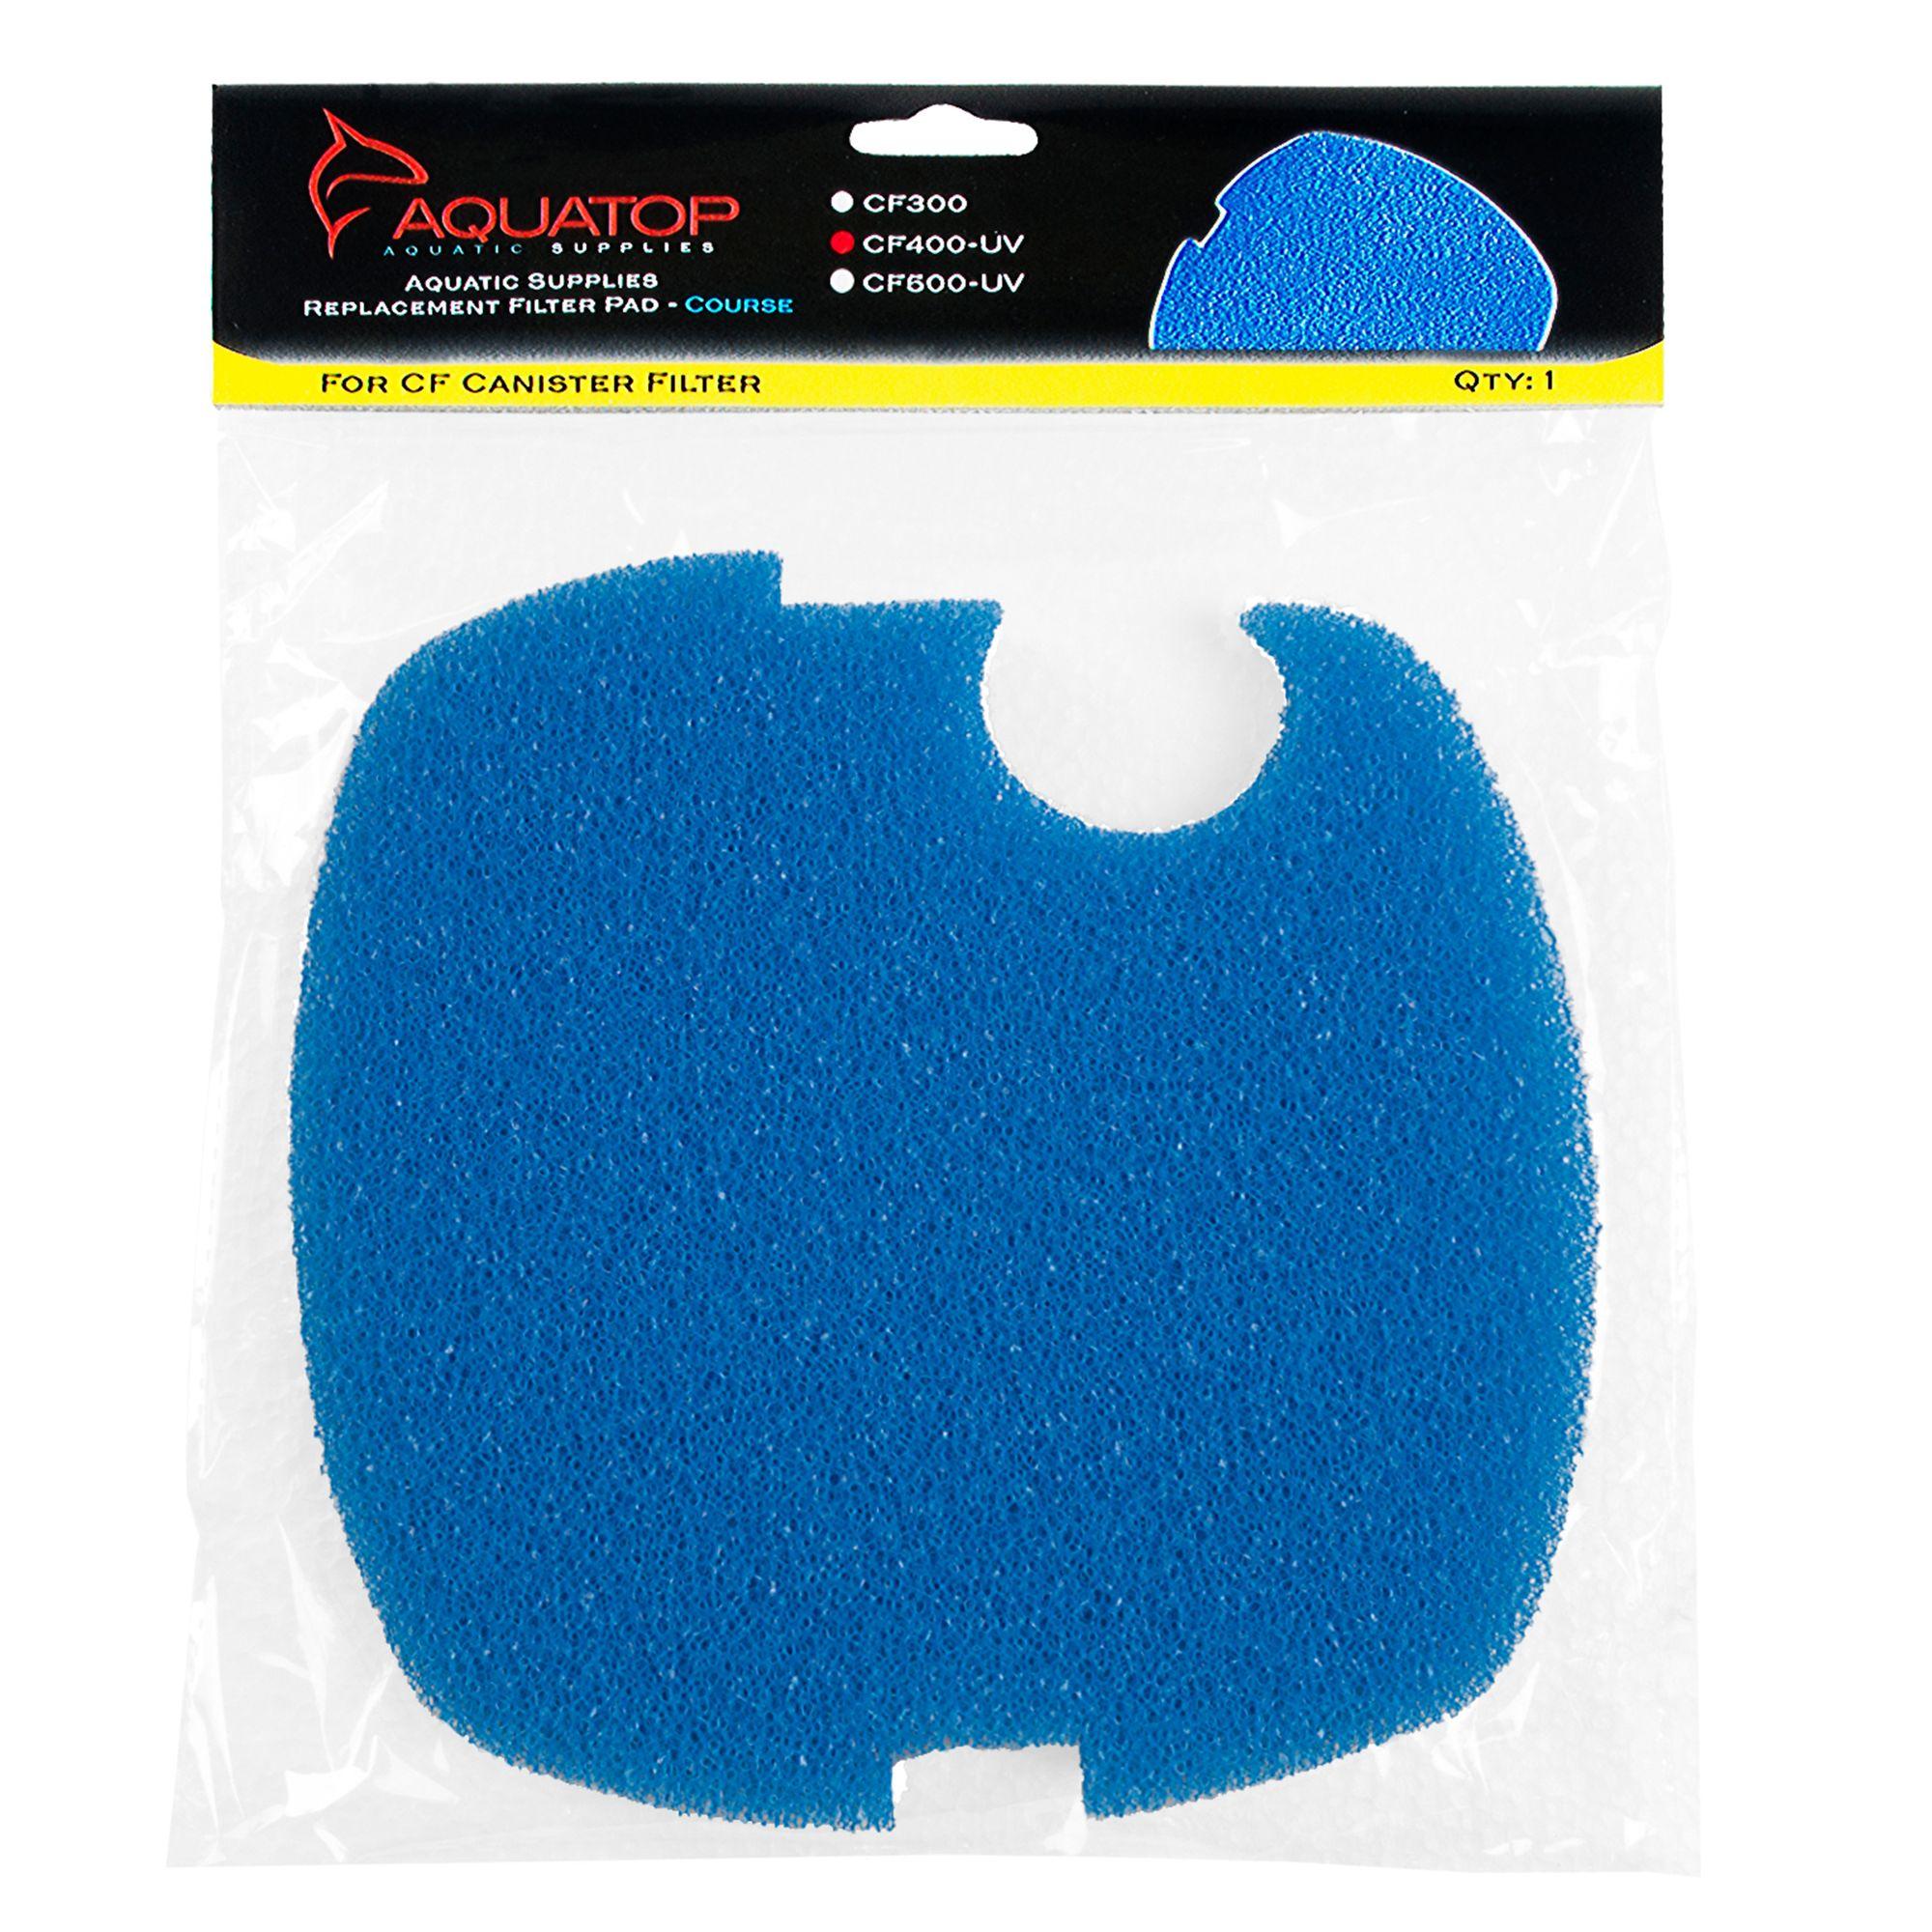 Aquatop Replacement Coarse Filter Sponge Cf400 Uv Size 1 Count